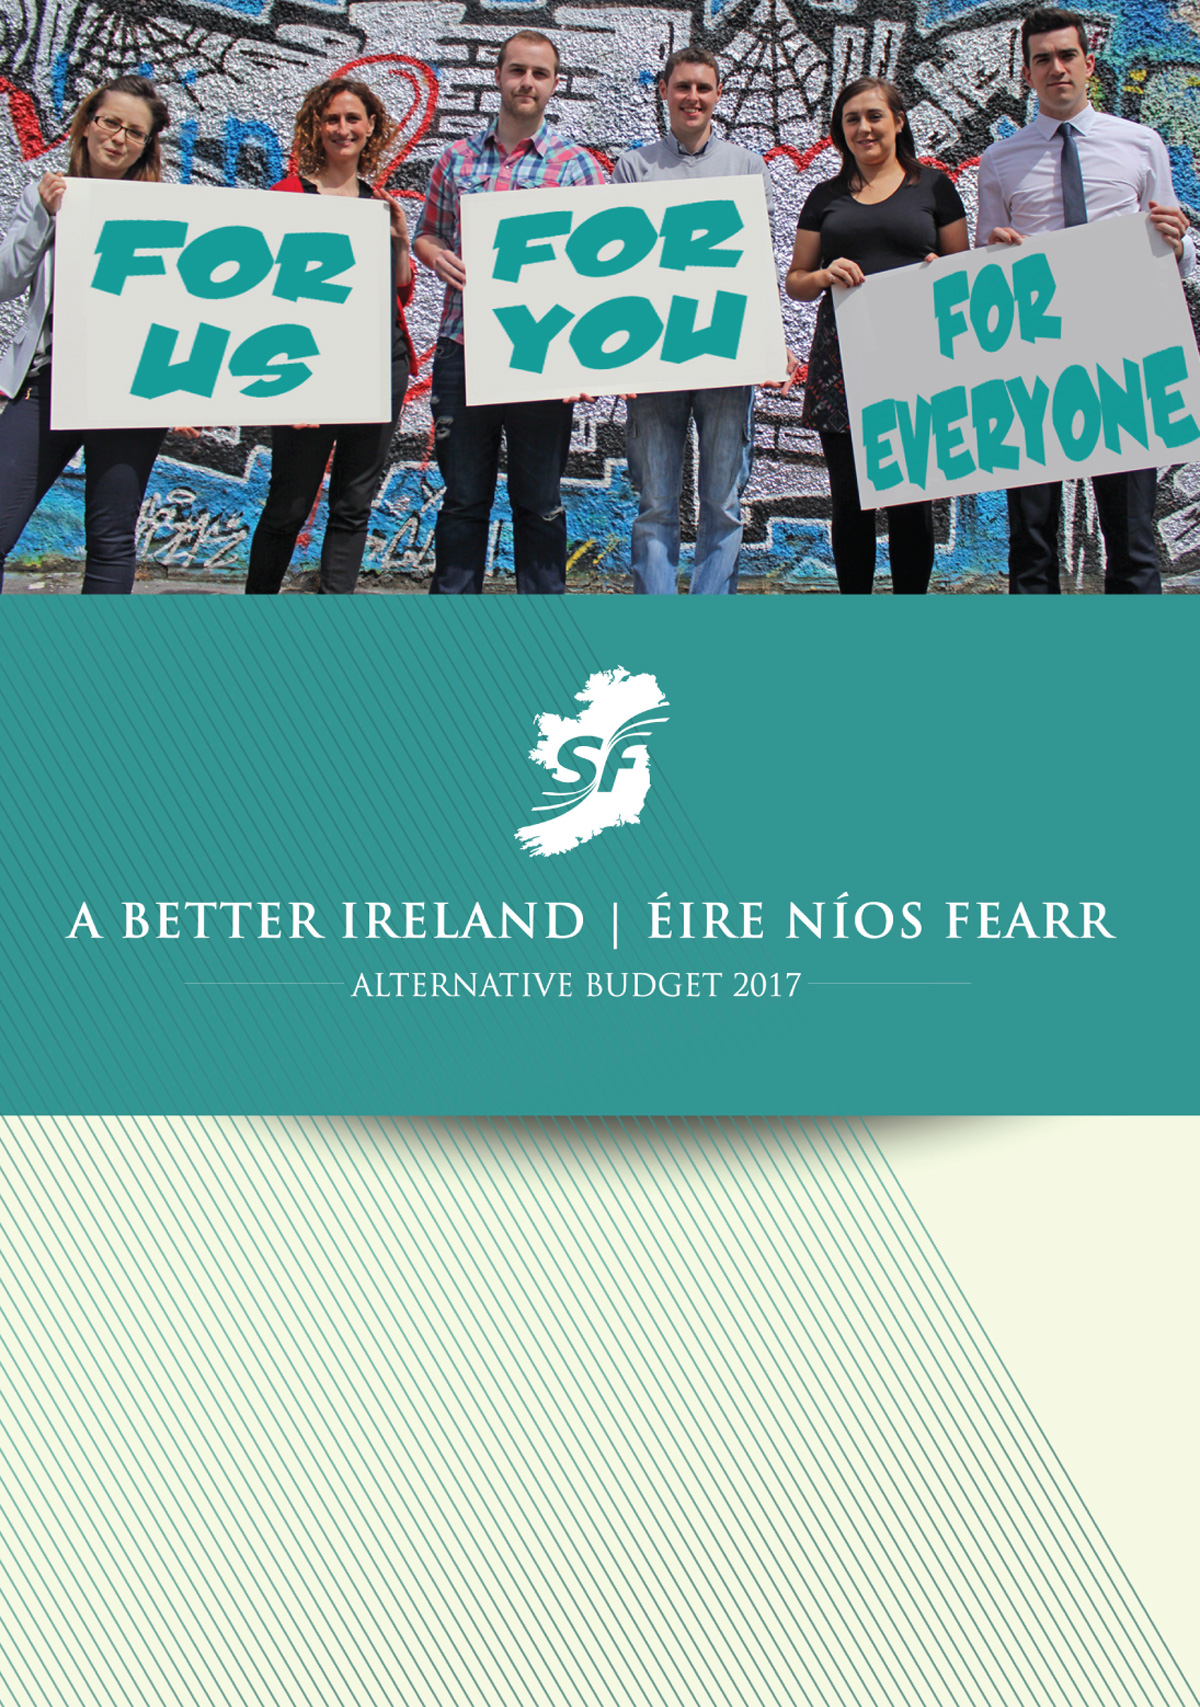 Budget 2017 PDF